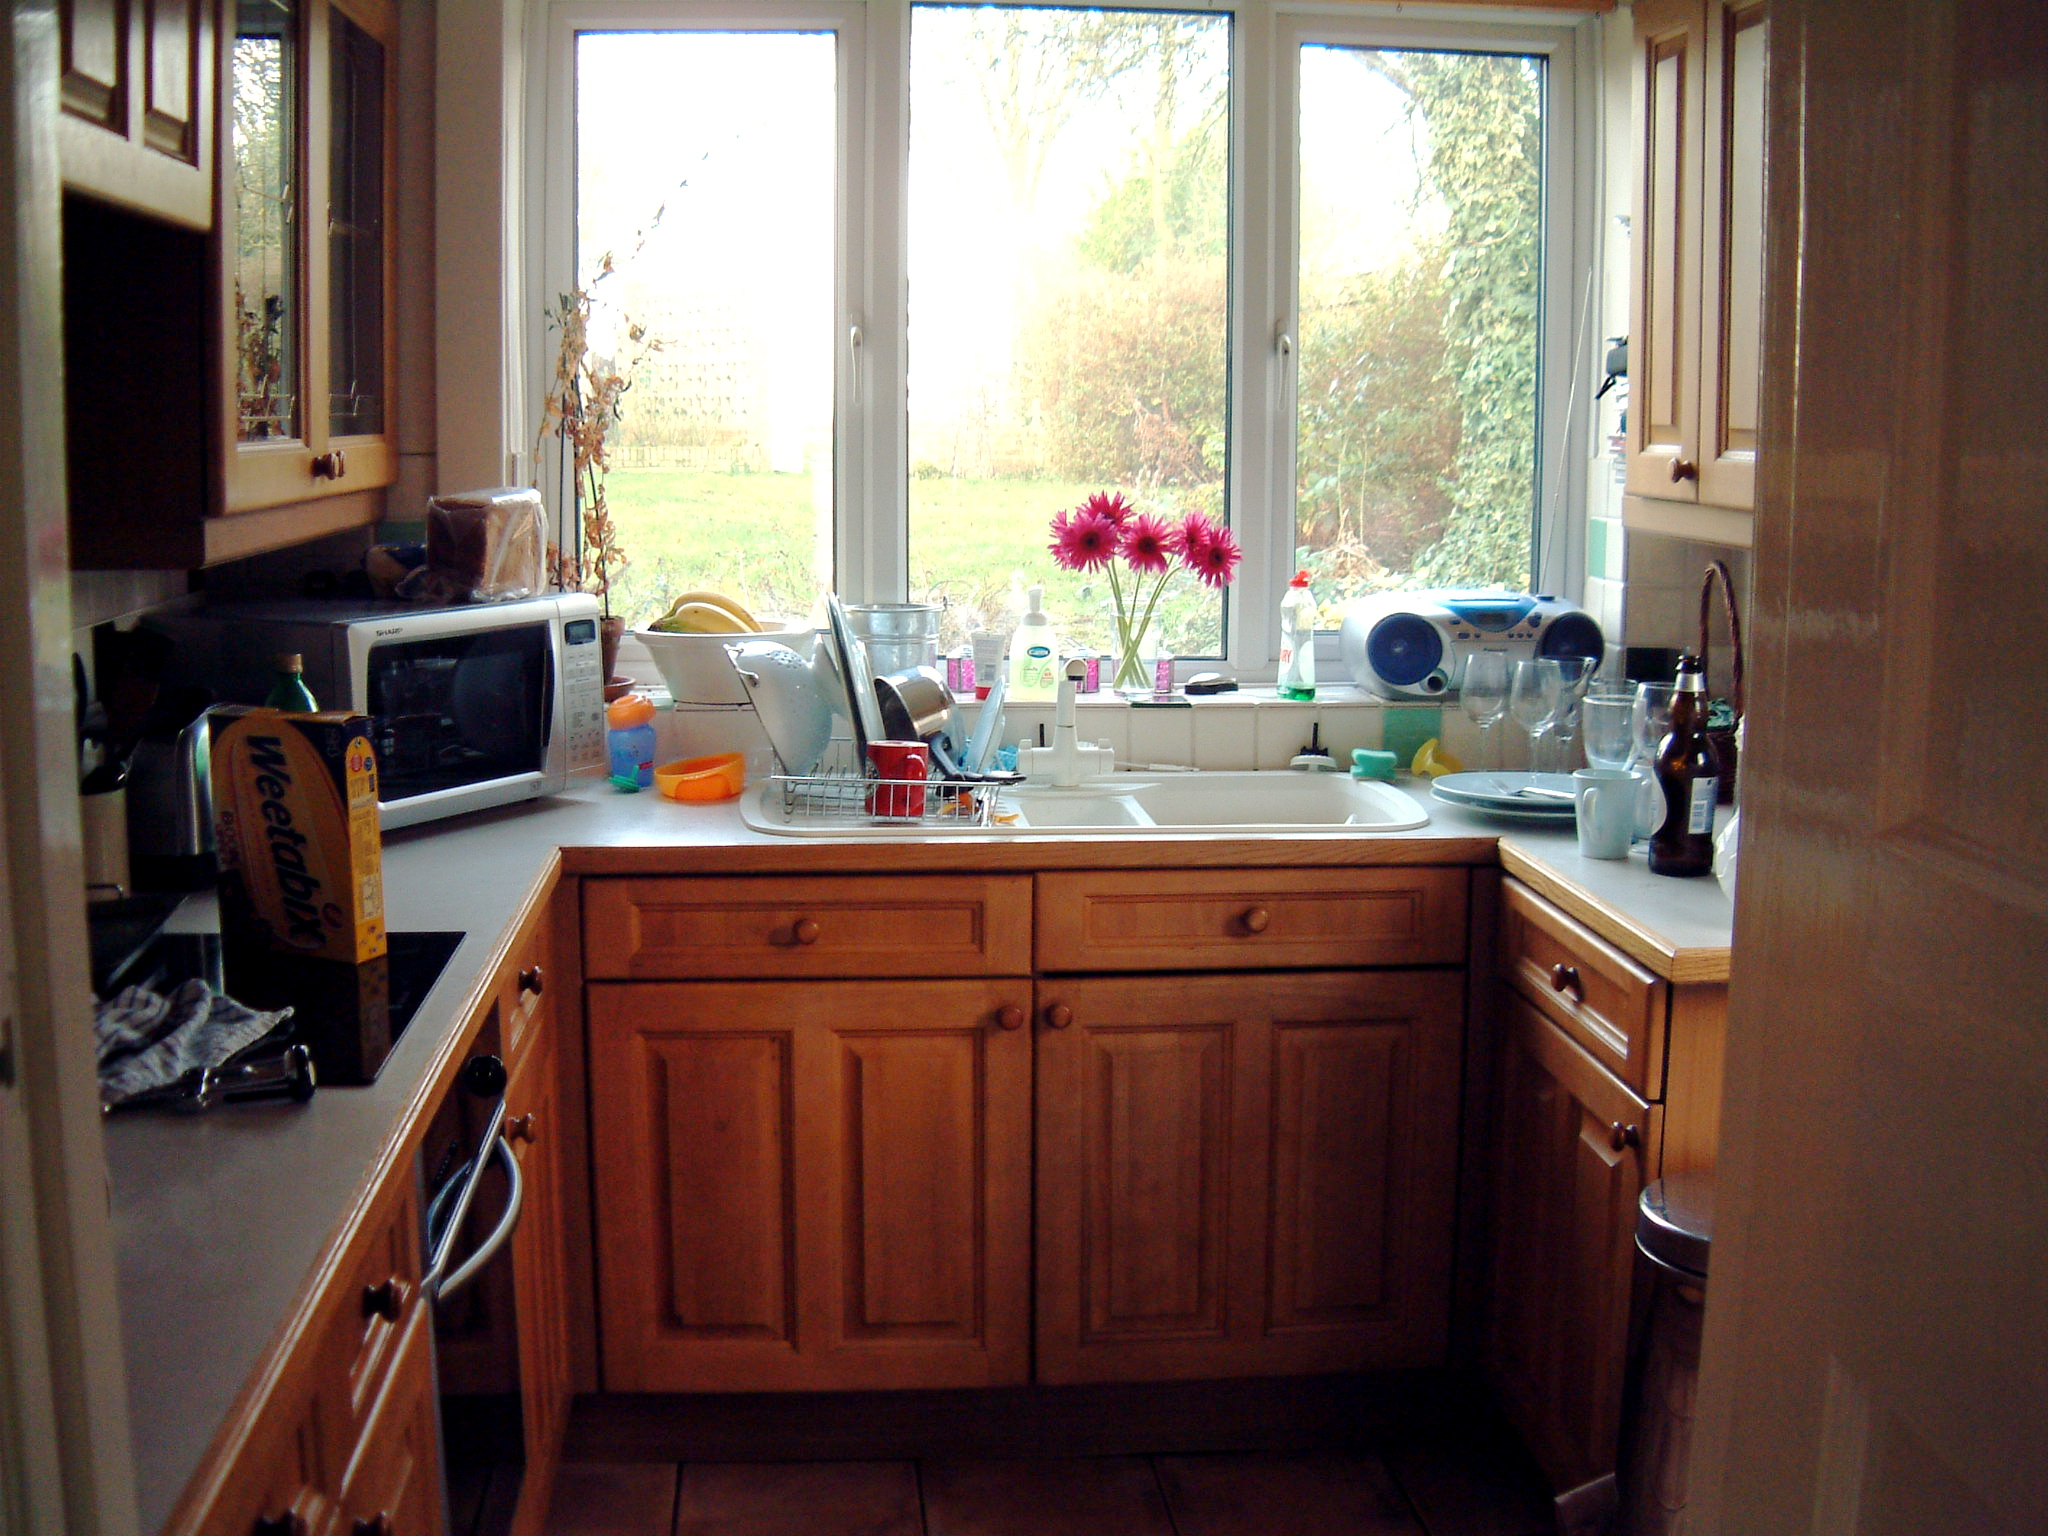 Small Rectangular Kitchen Design Ideas ~ اجمل تصميم مطبخ صغير بالصور المرسال